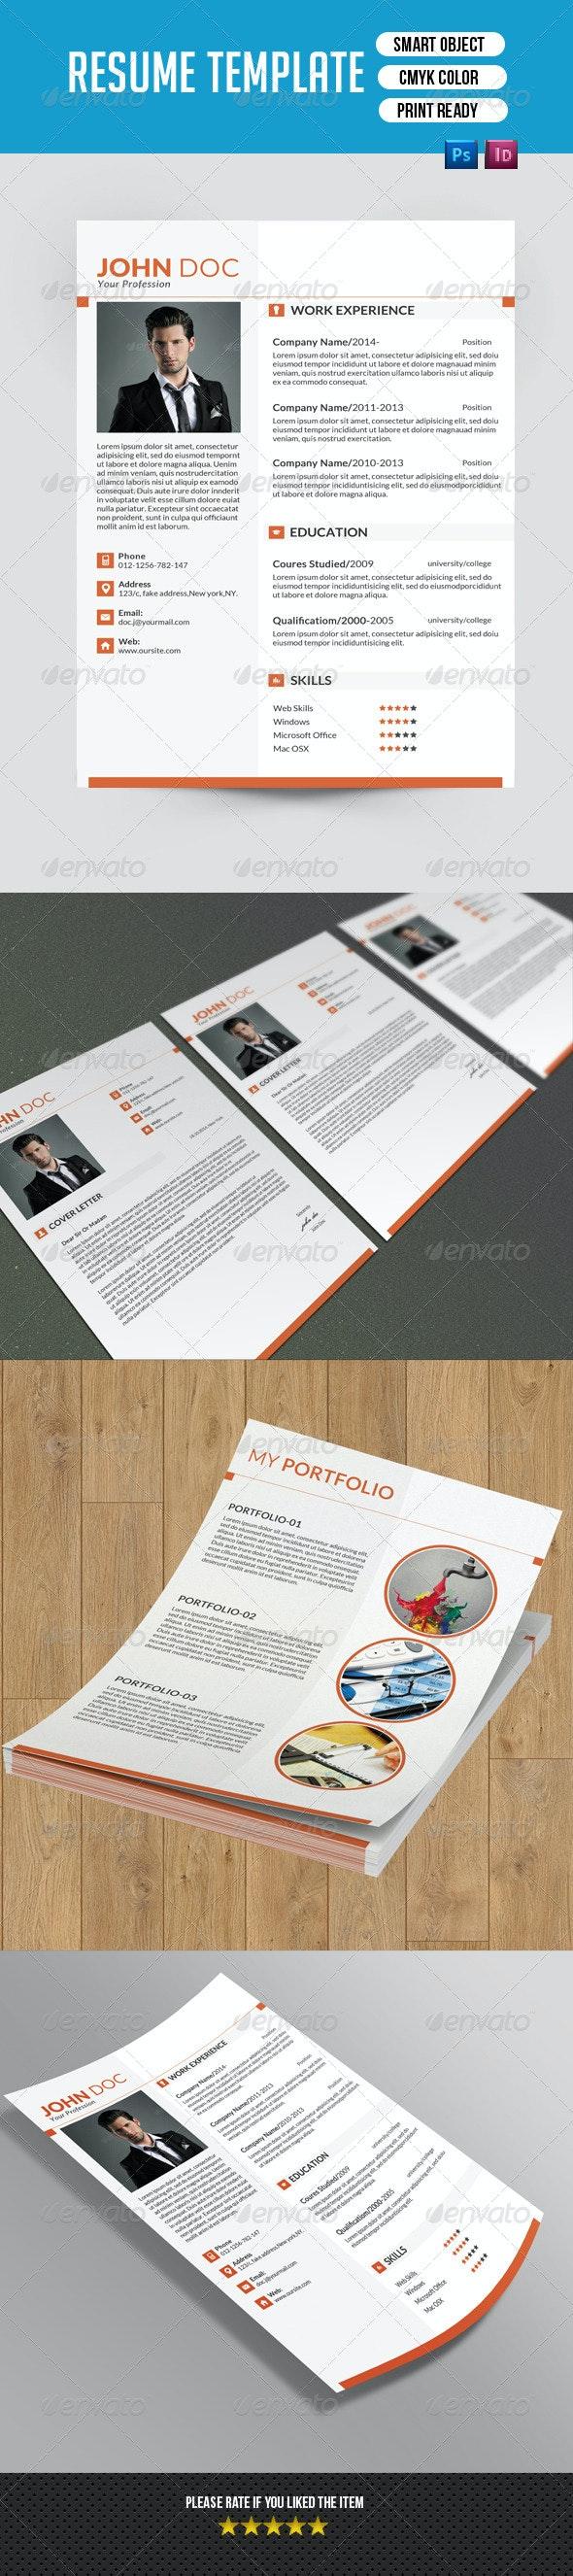 Minimal Resume Template-V02 - Resumes Stationery